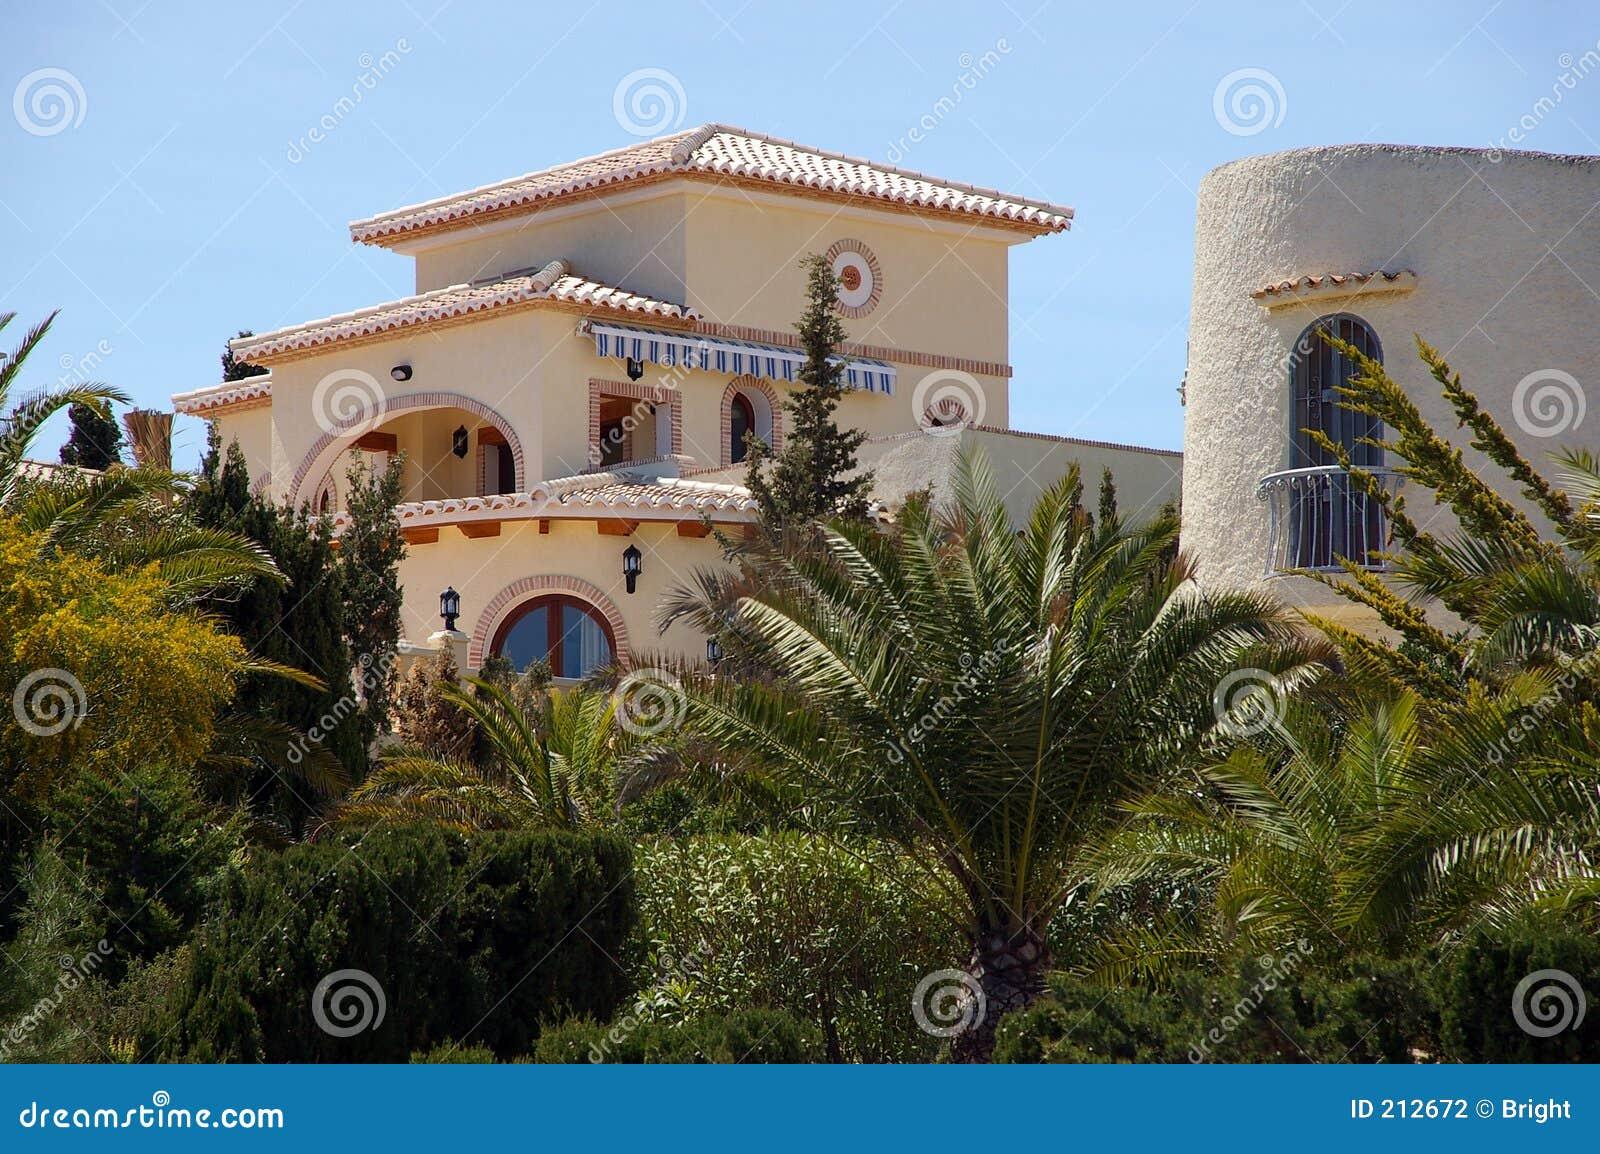 http://thumbs.dreamstime.com/z/spanish-villa-212672.jpg